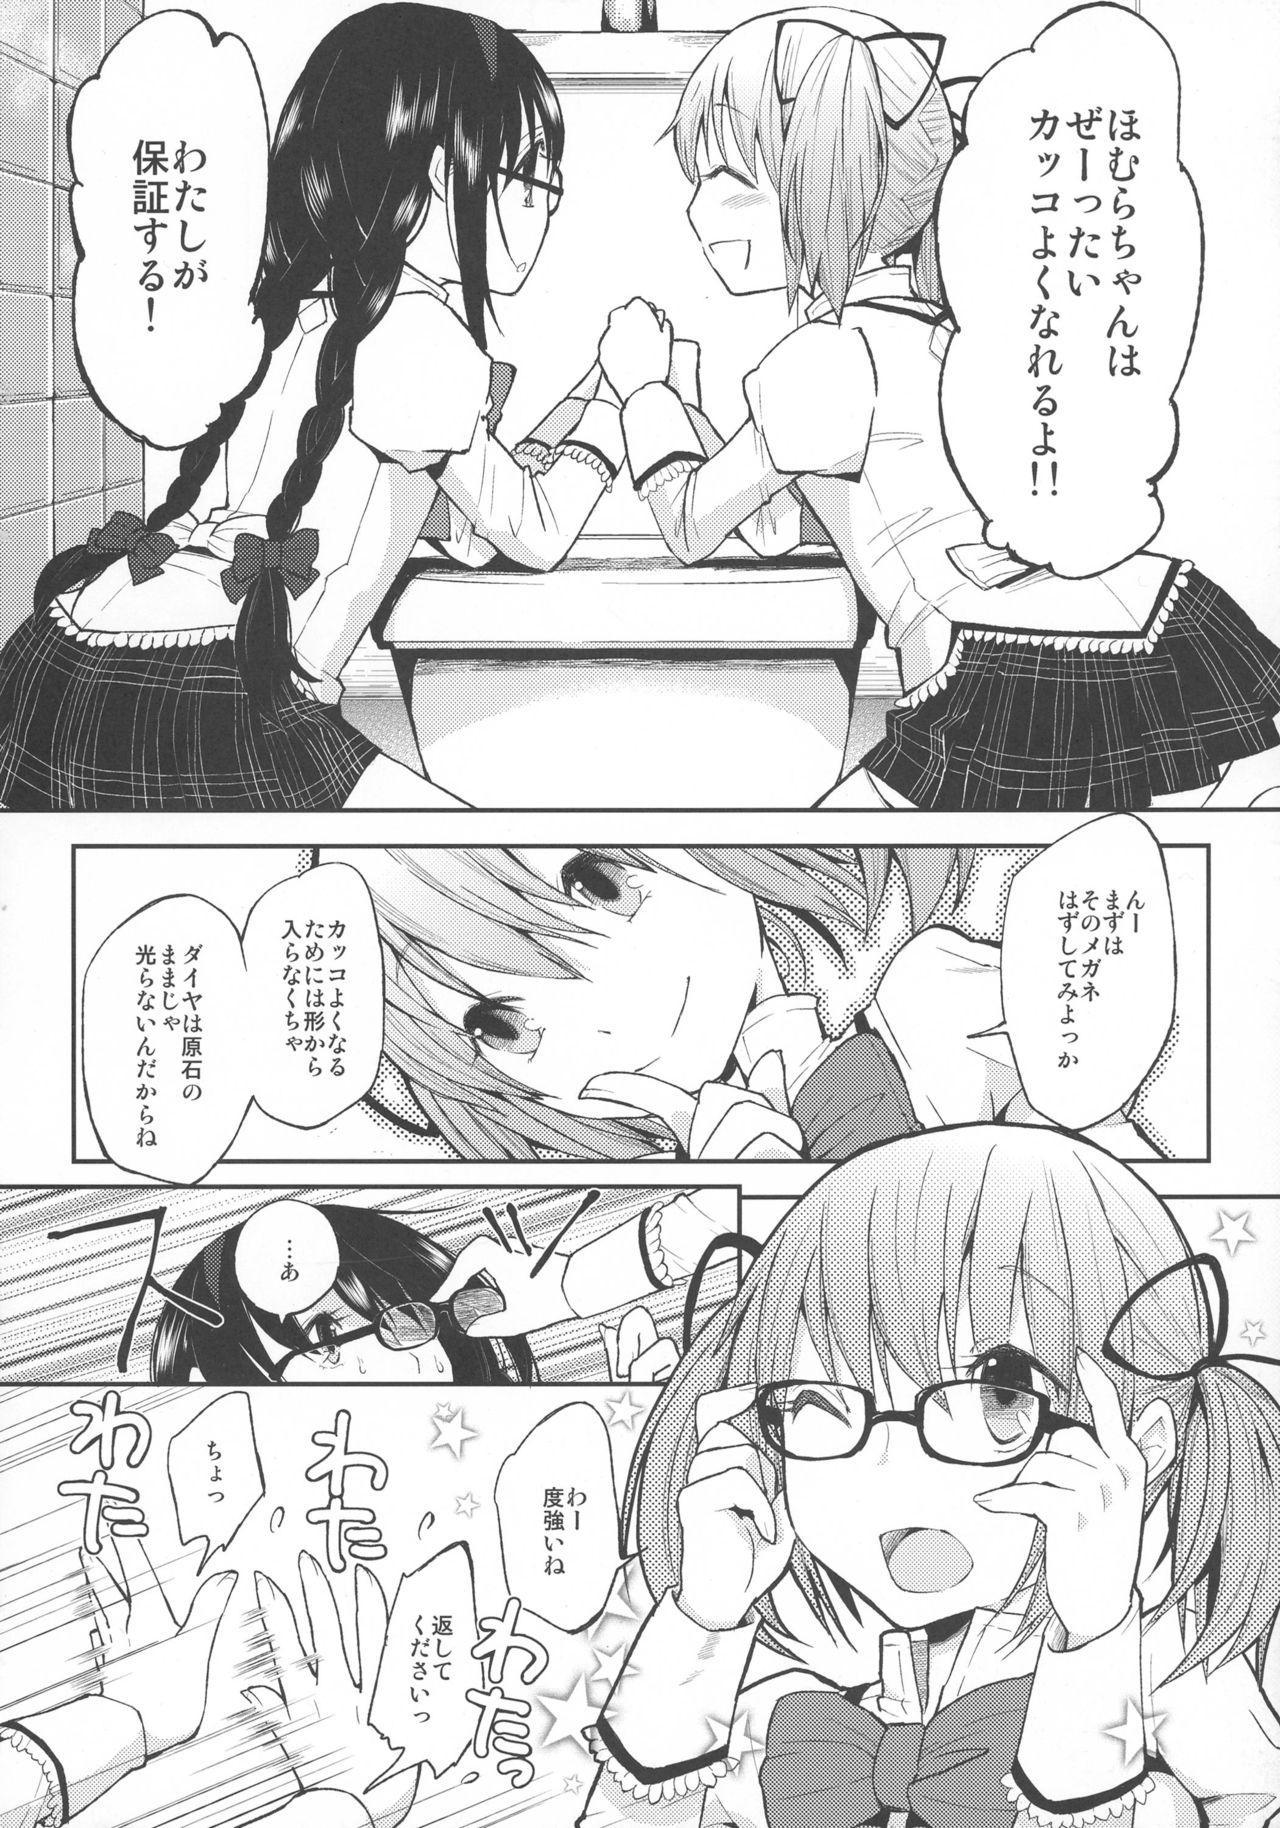 Confession 5